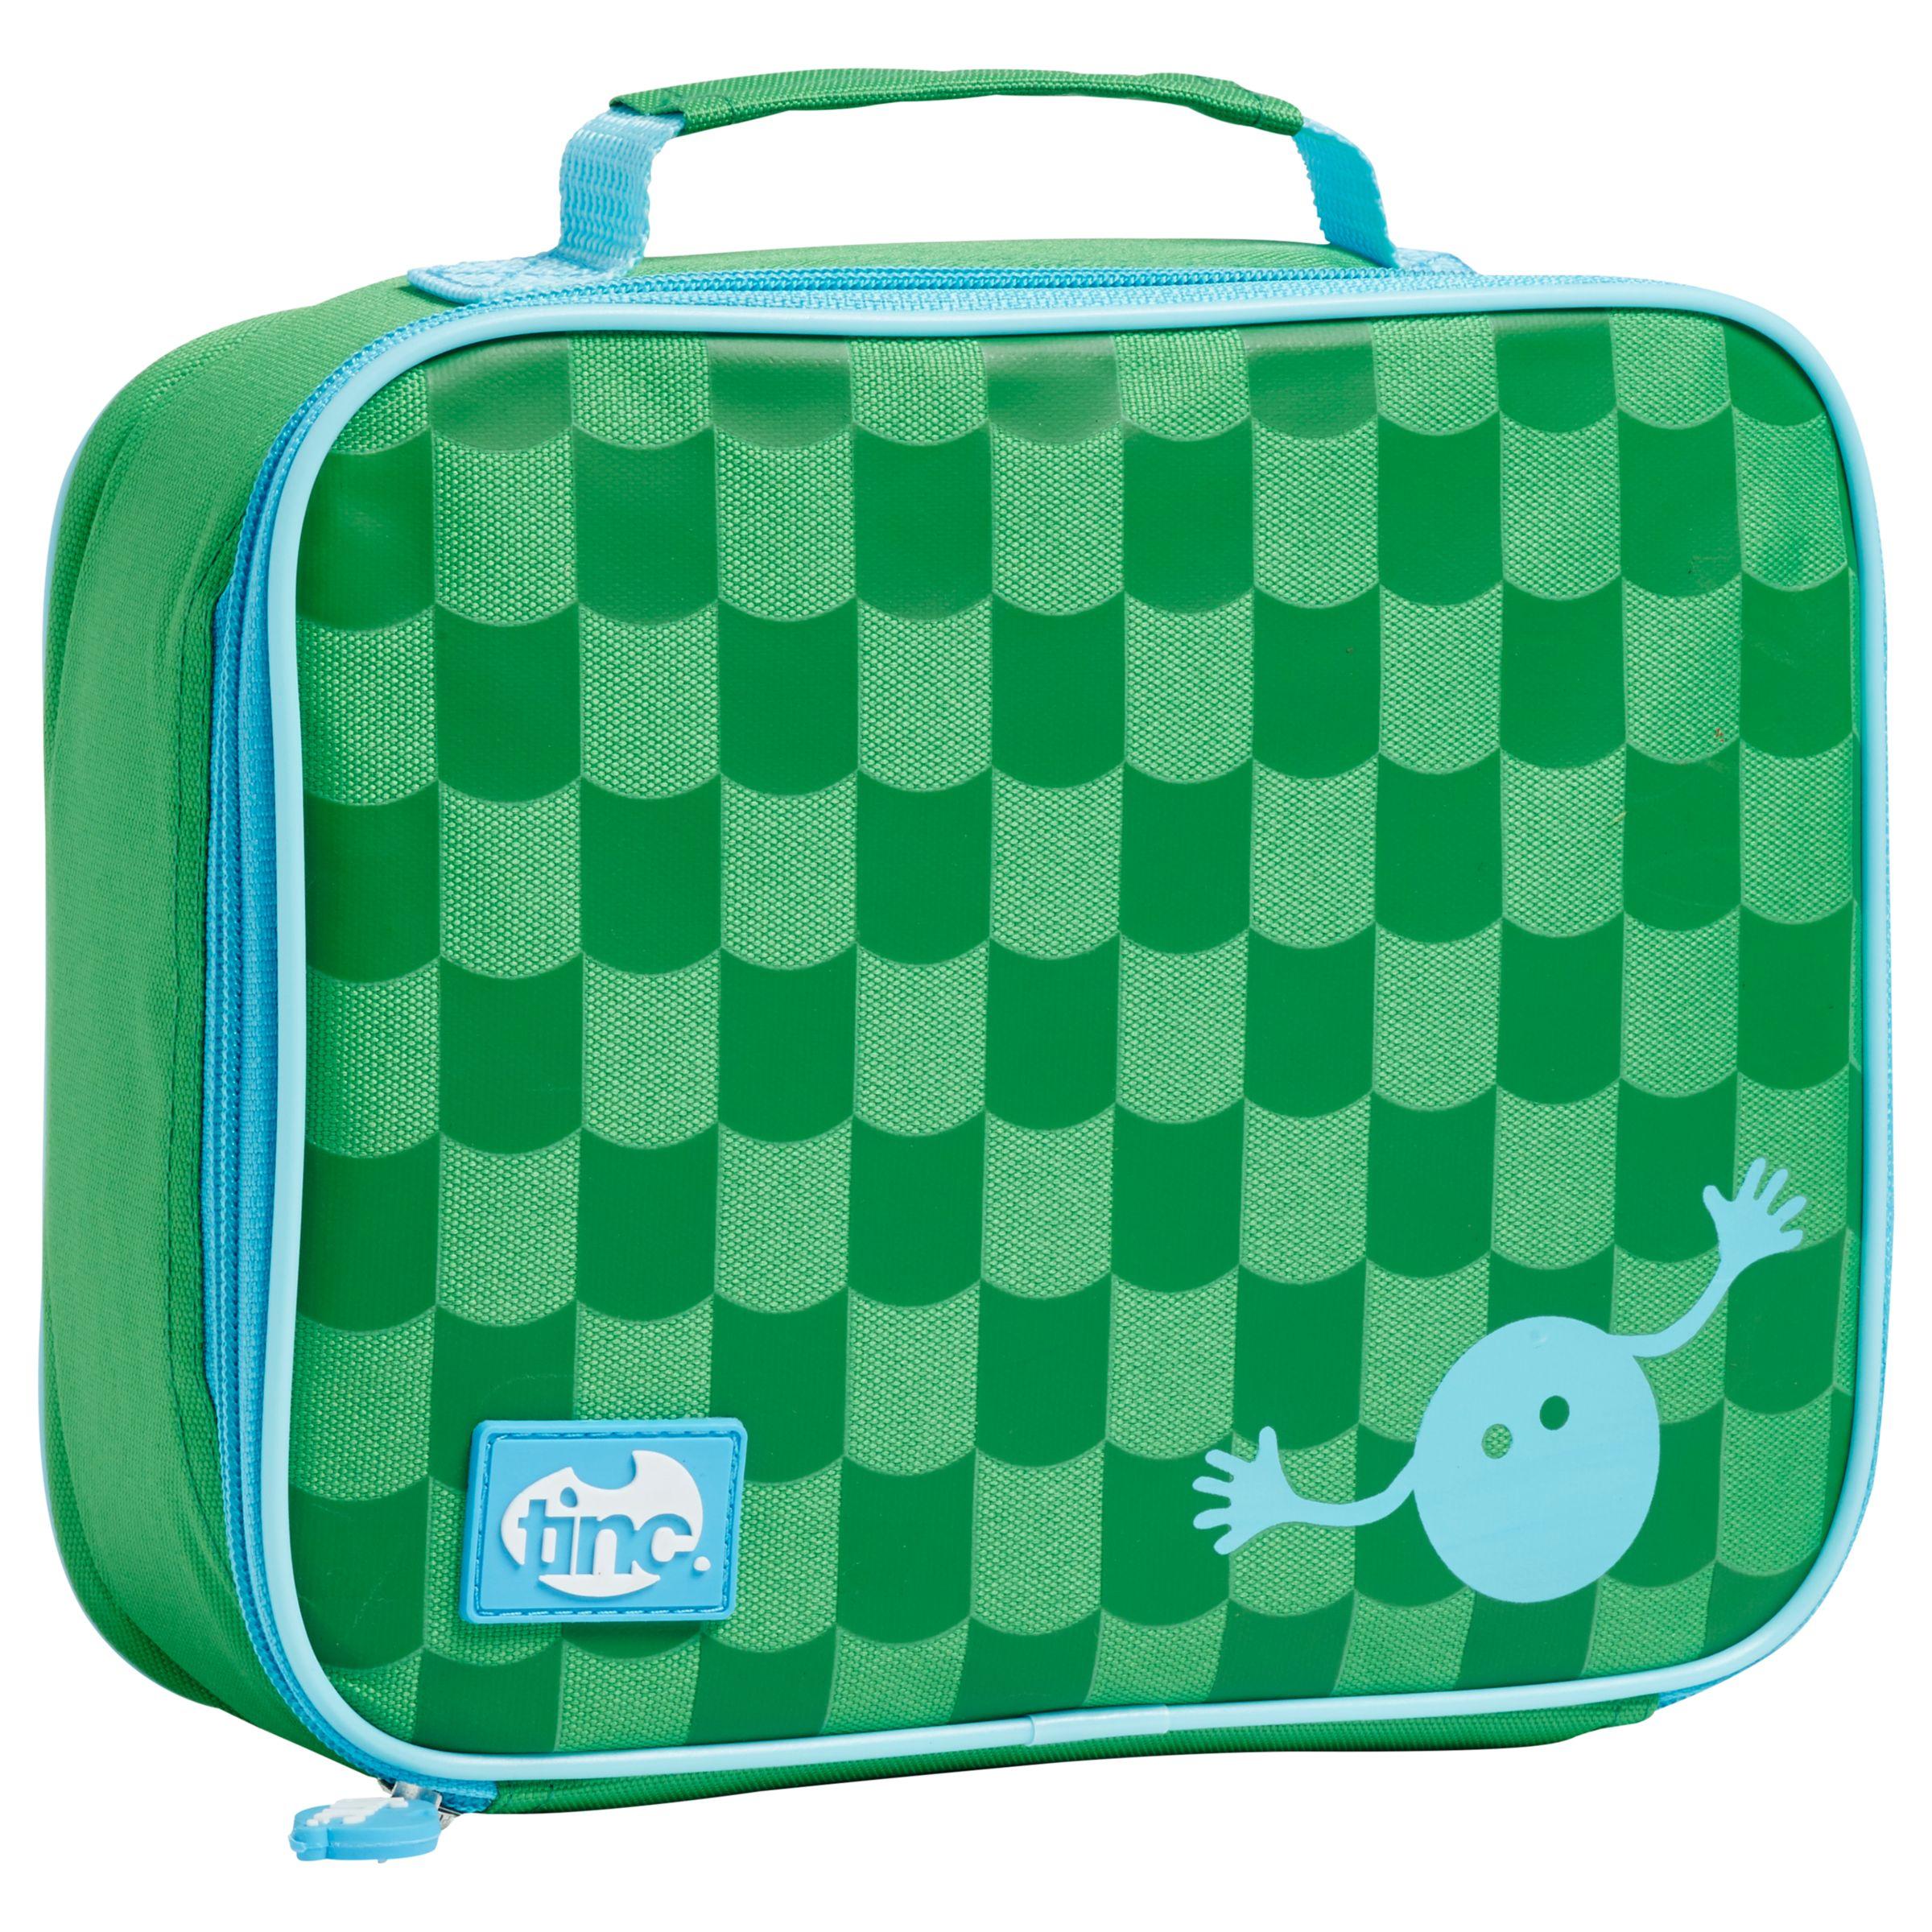 Tinc Tinc Geometric Lunchbox, Green / Blue